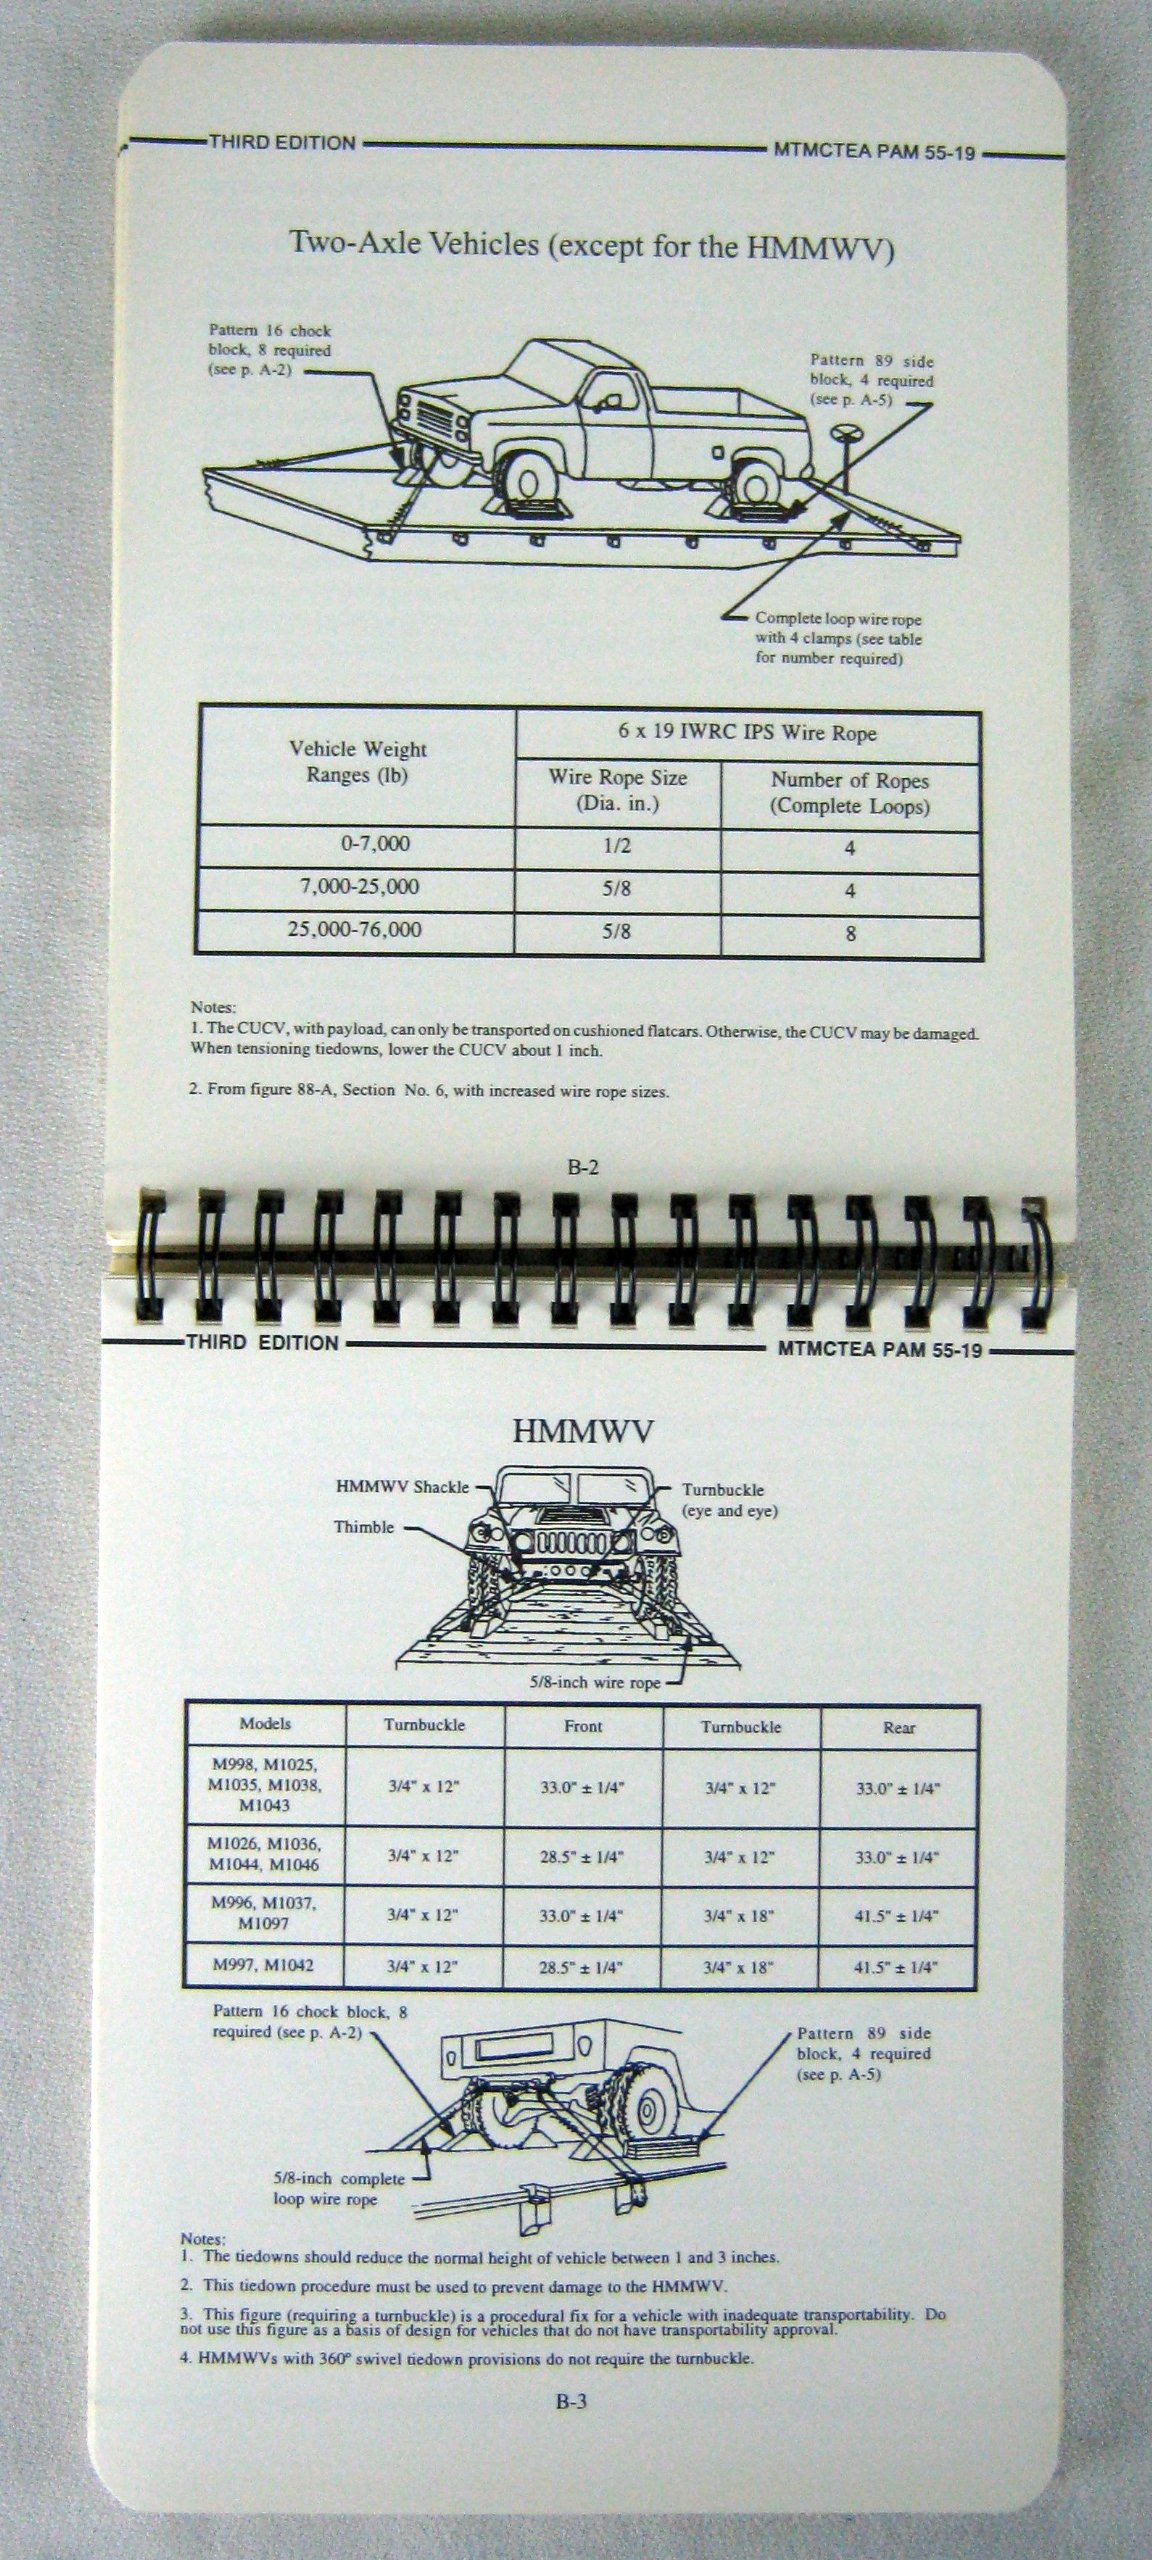 Tiedown Handbook For Rail Movements Mtmctea Pamphlet 55 19 Robert Hmmwv Wiring Schematic E Et Al Kerr Books